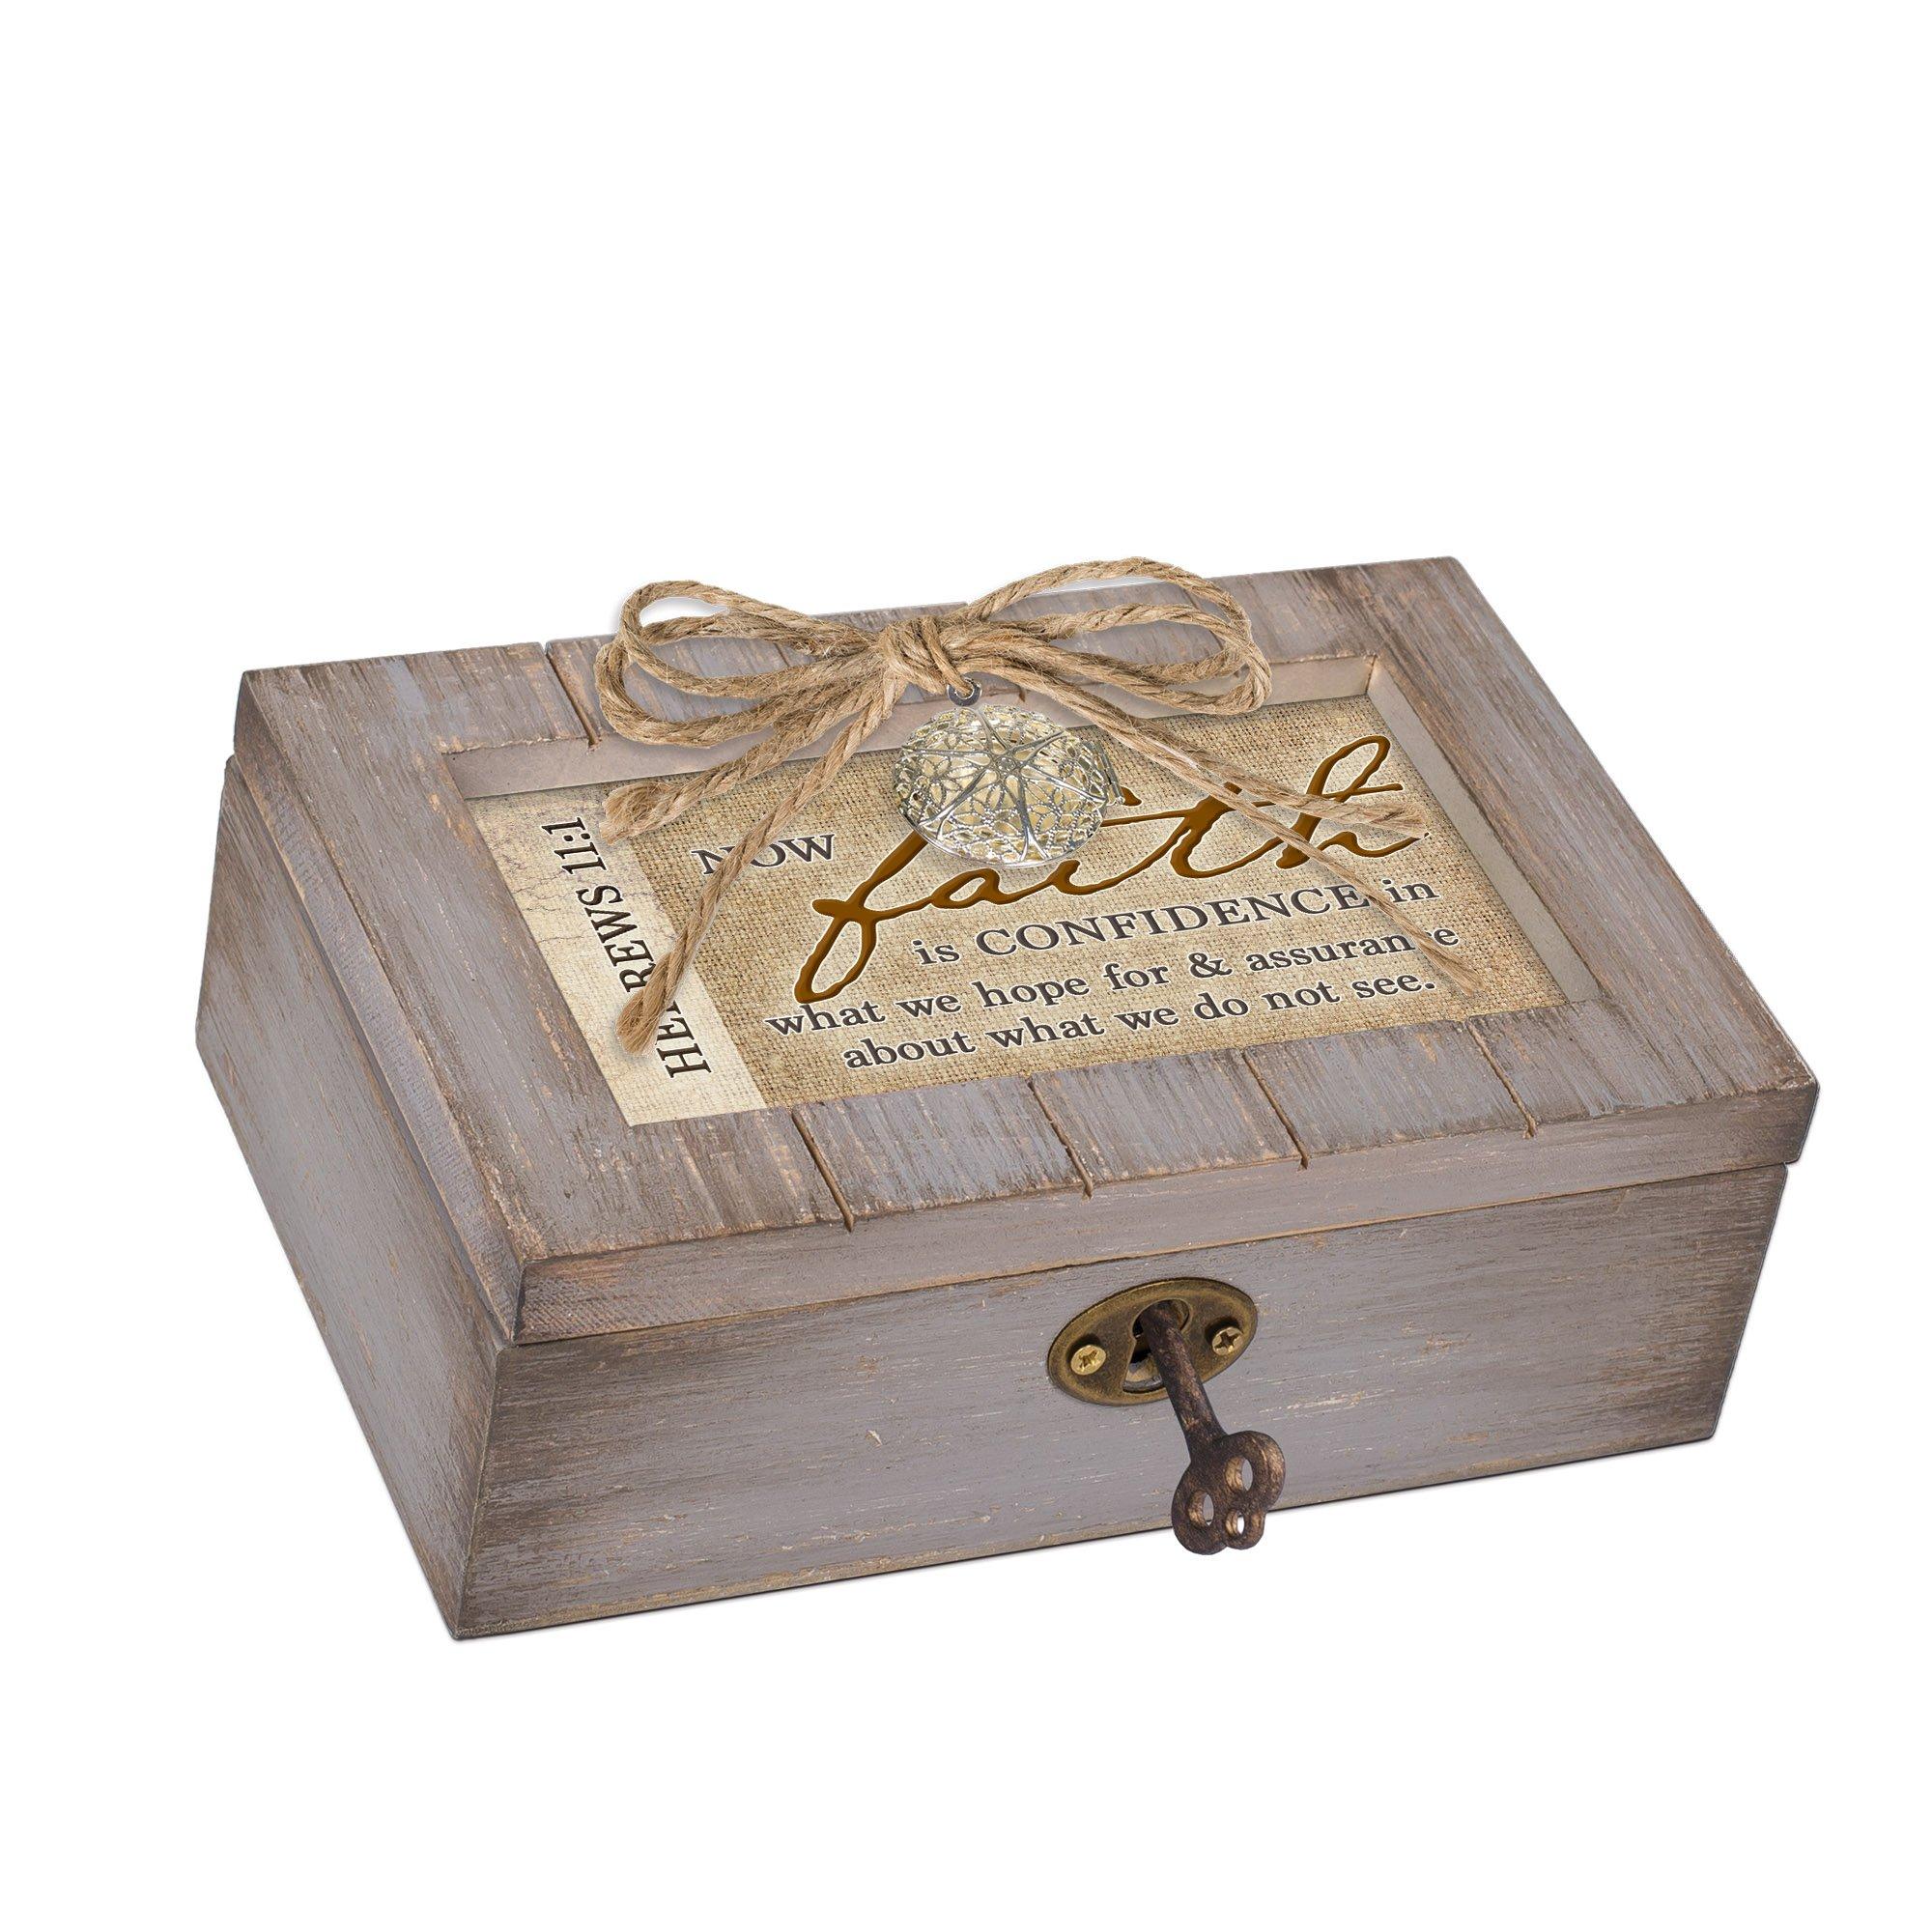 Cottage Garden Faith Is Confidence Assurance Grey Locket Petite Music Box Plays Friend In Jesus